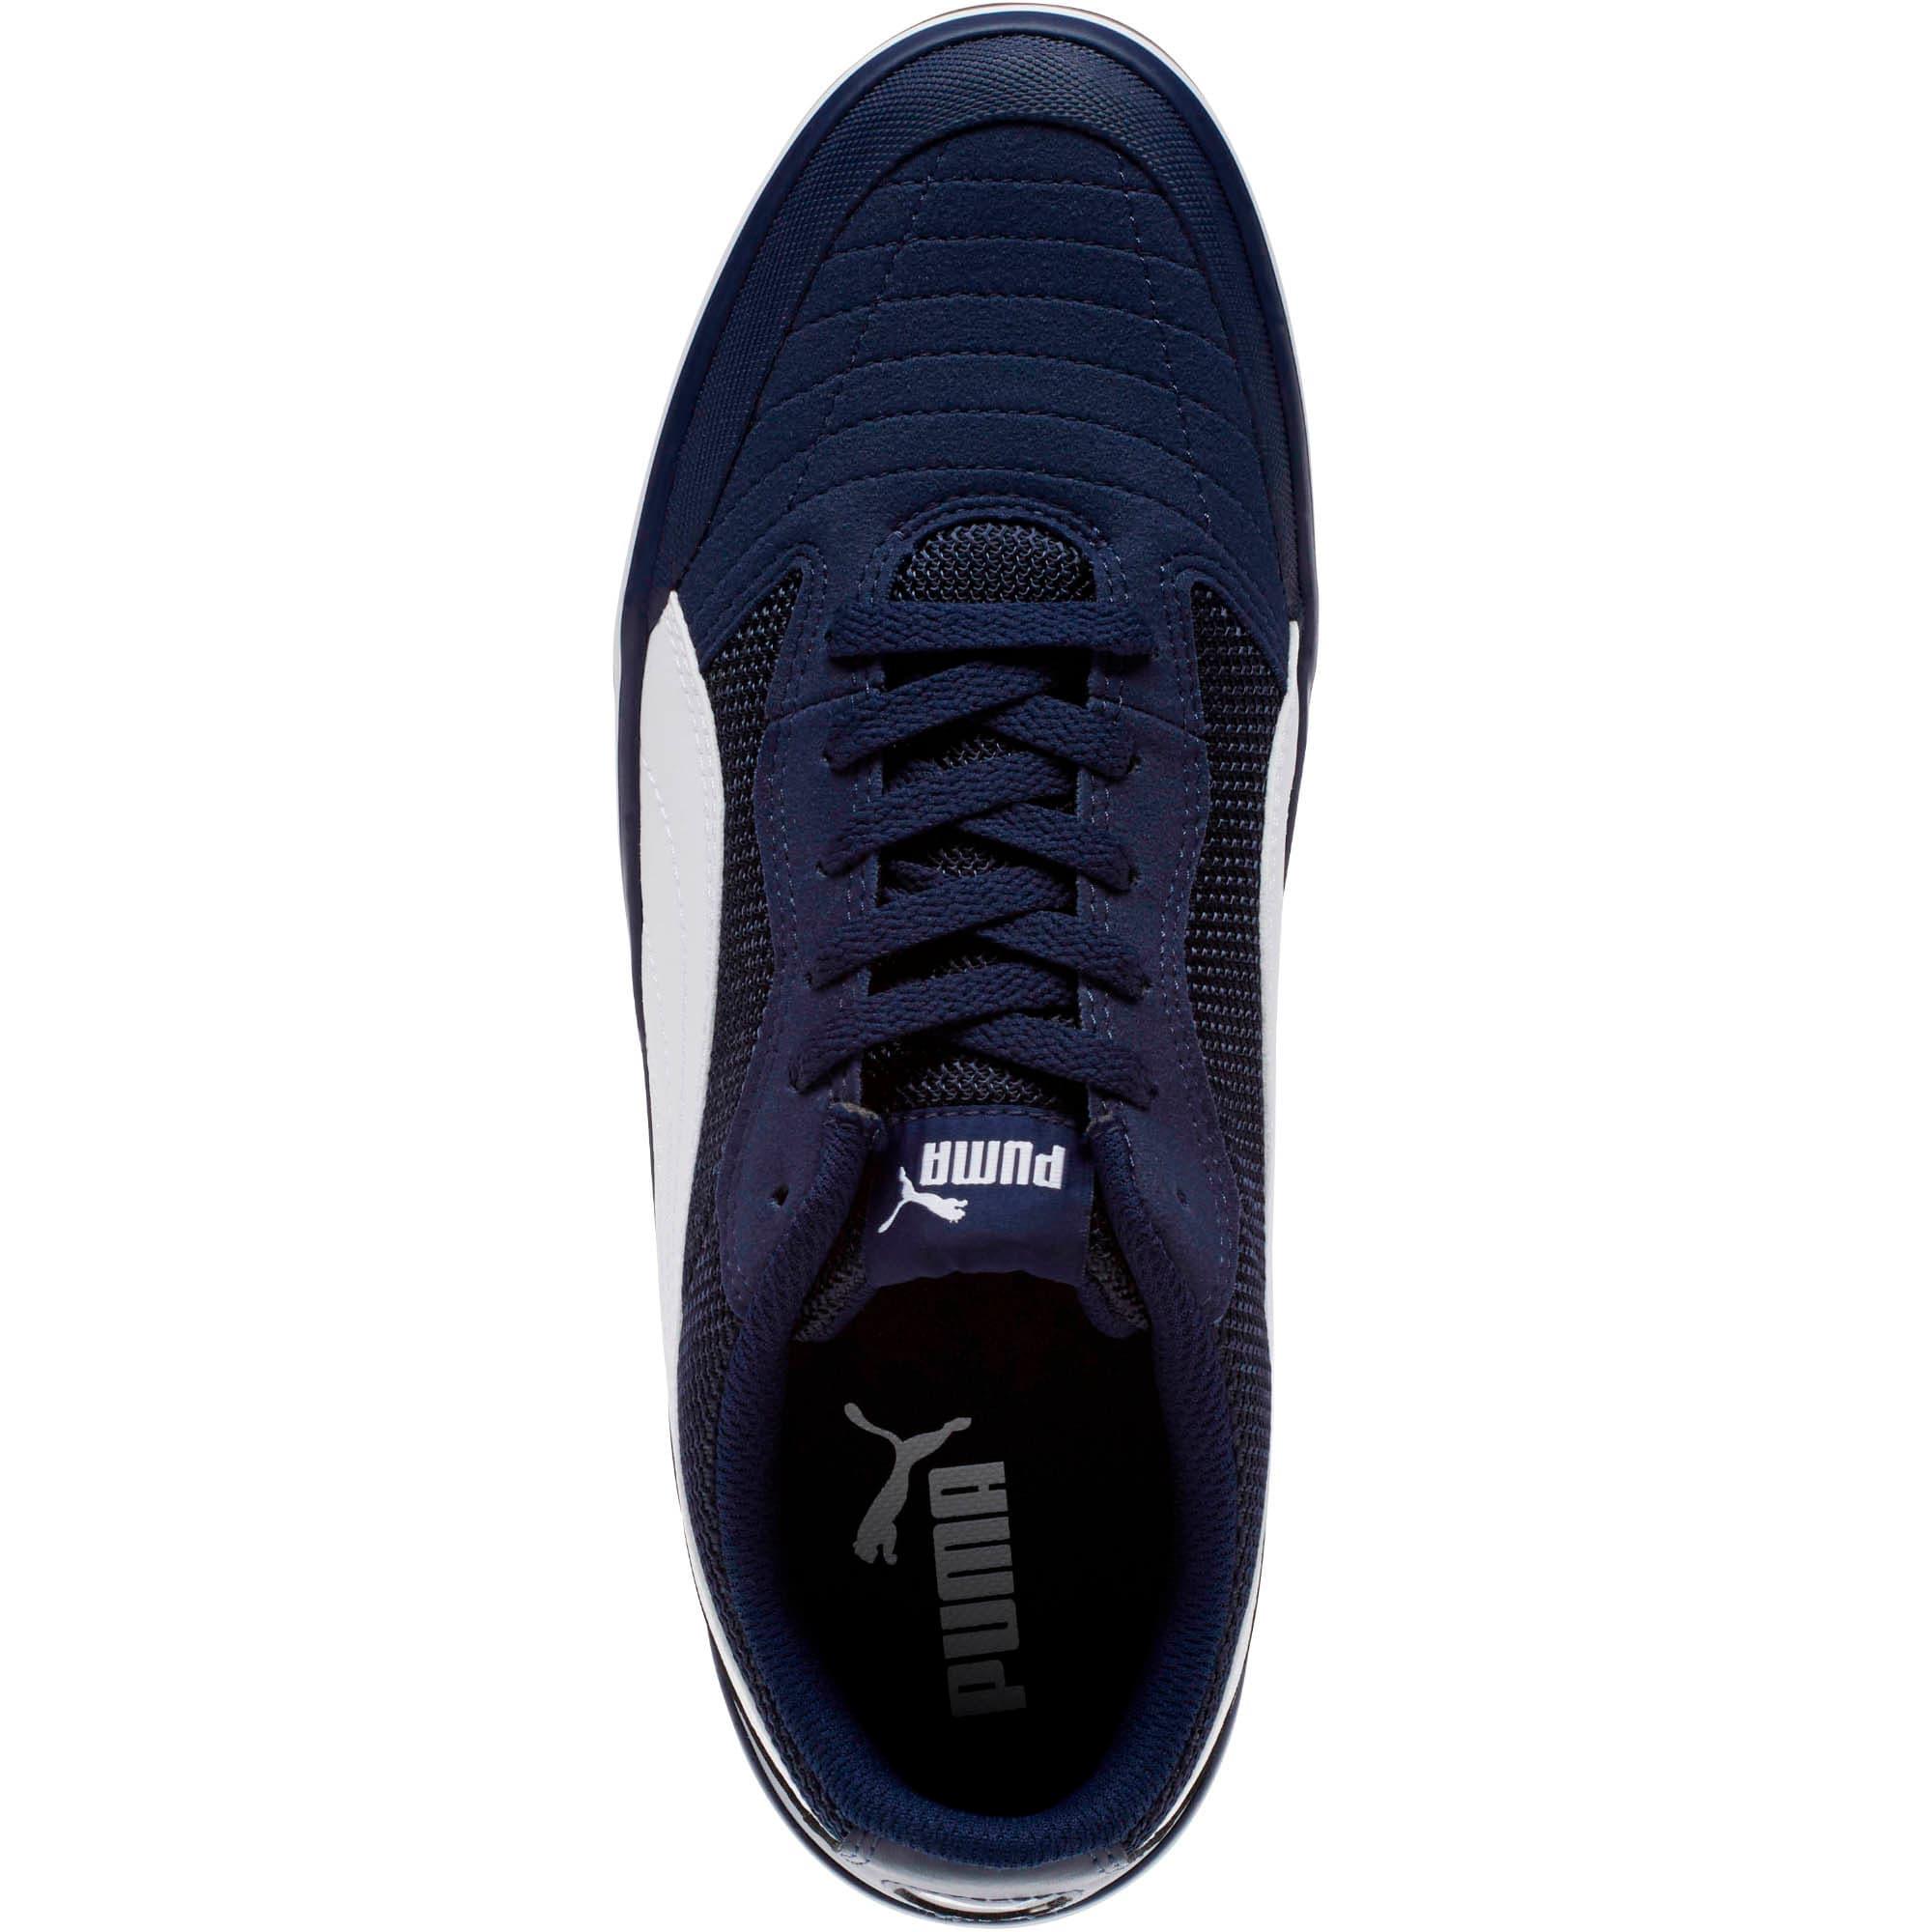 Miniatura 5 de Zapatos deportivos Astro Sala para hombre, Peacoat-Puma White, mediano